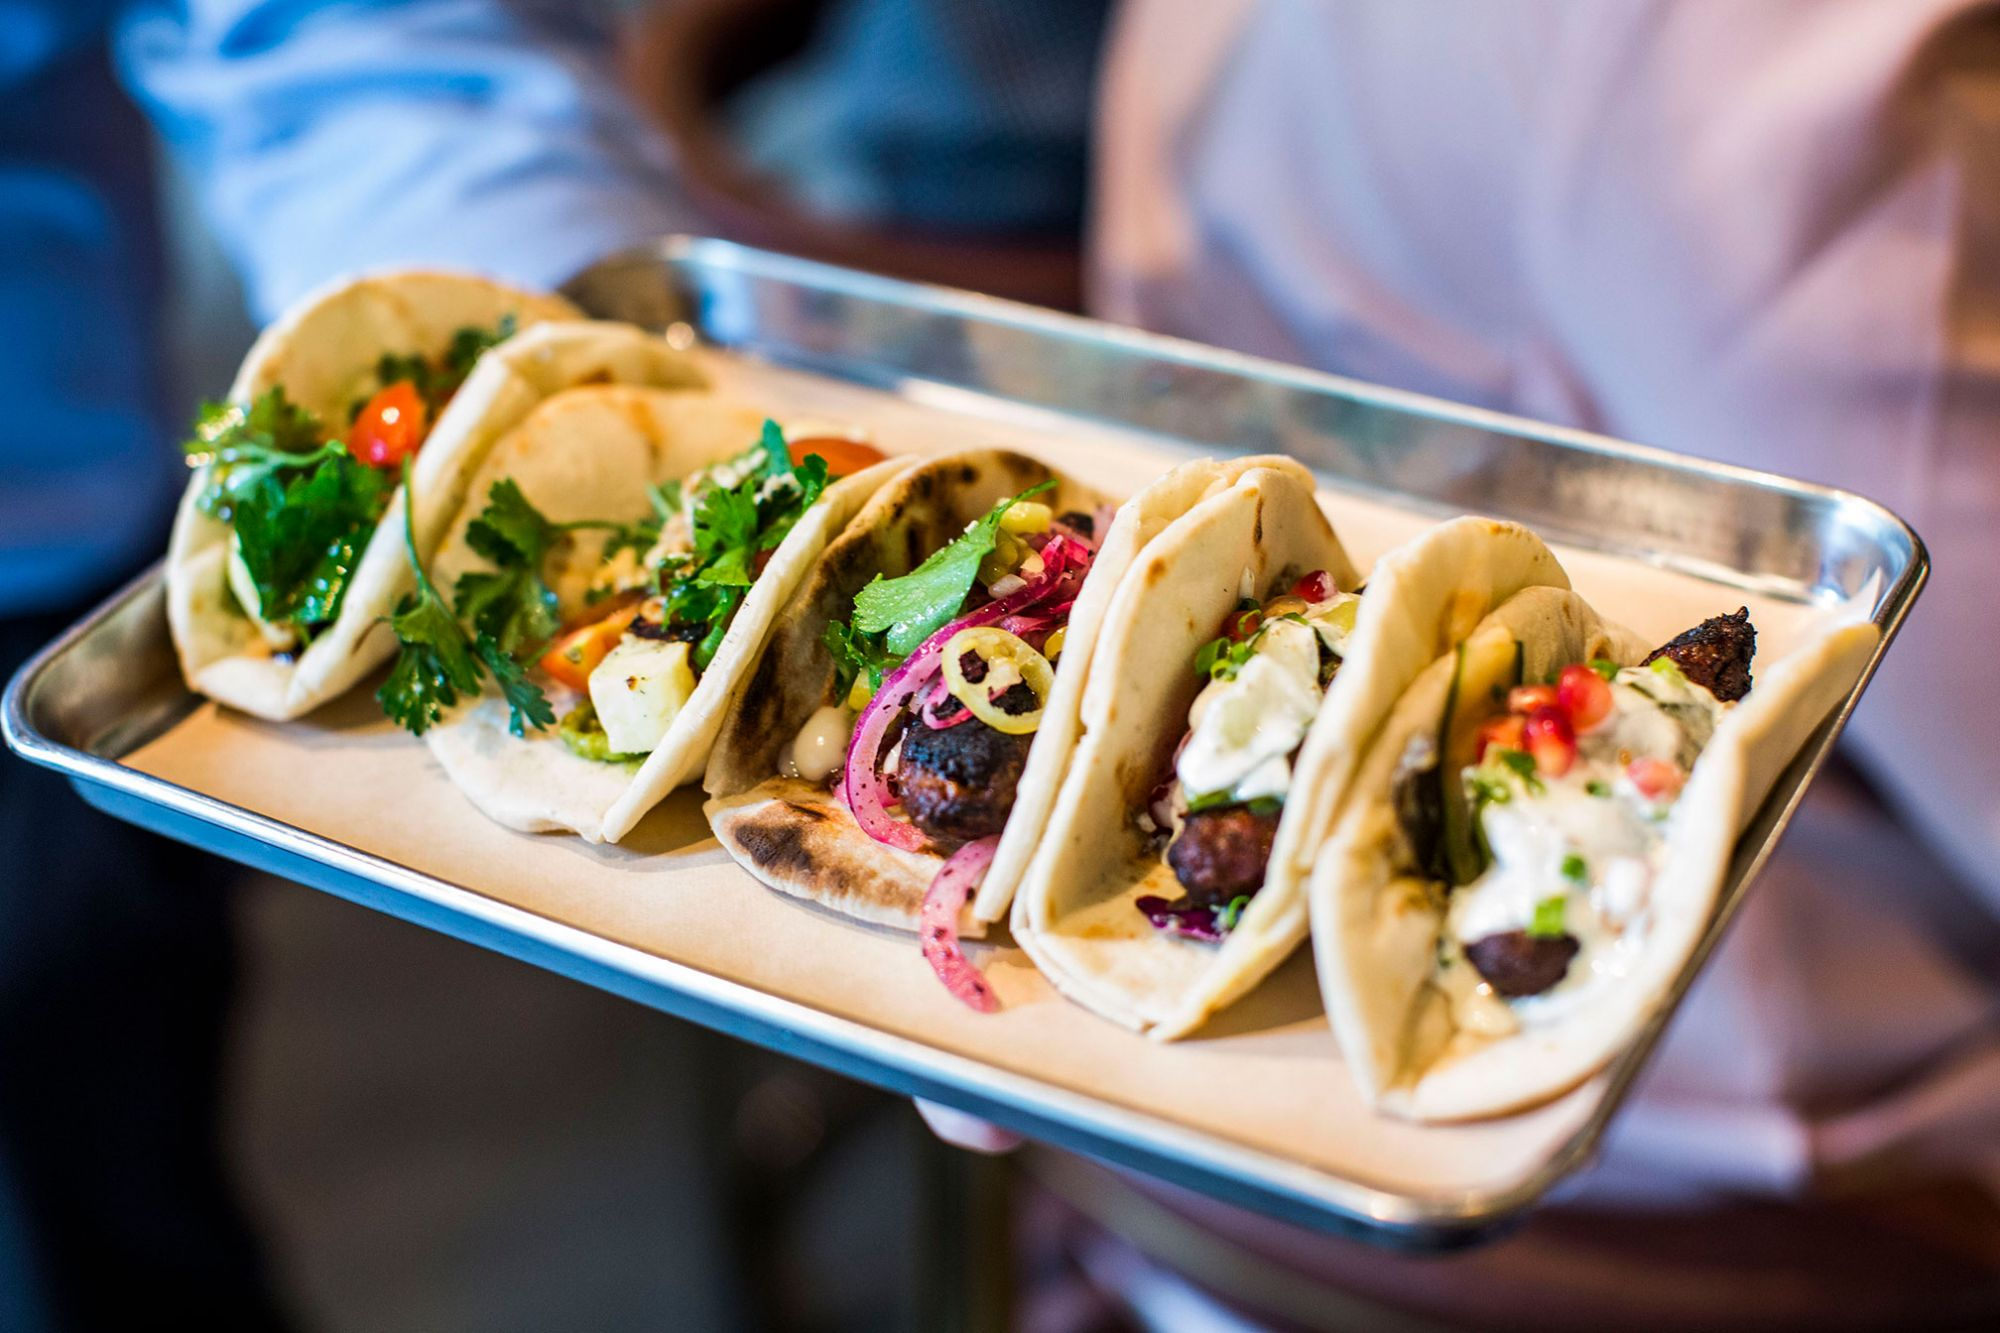 Where To Eat This Week: Blackwattle, Ma Cuisine, Fat Prince, Hai Tien Lo, Ash & Elm